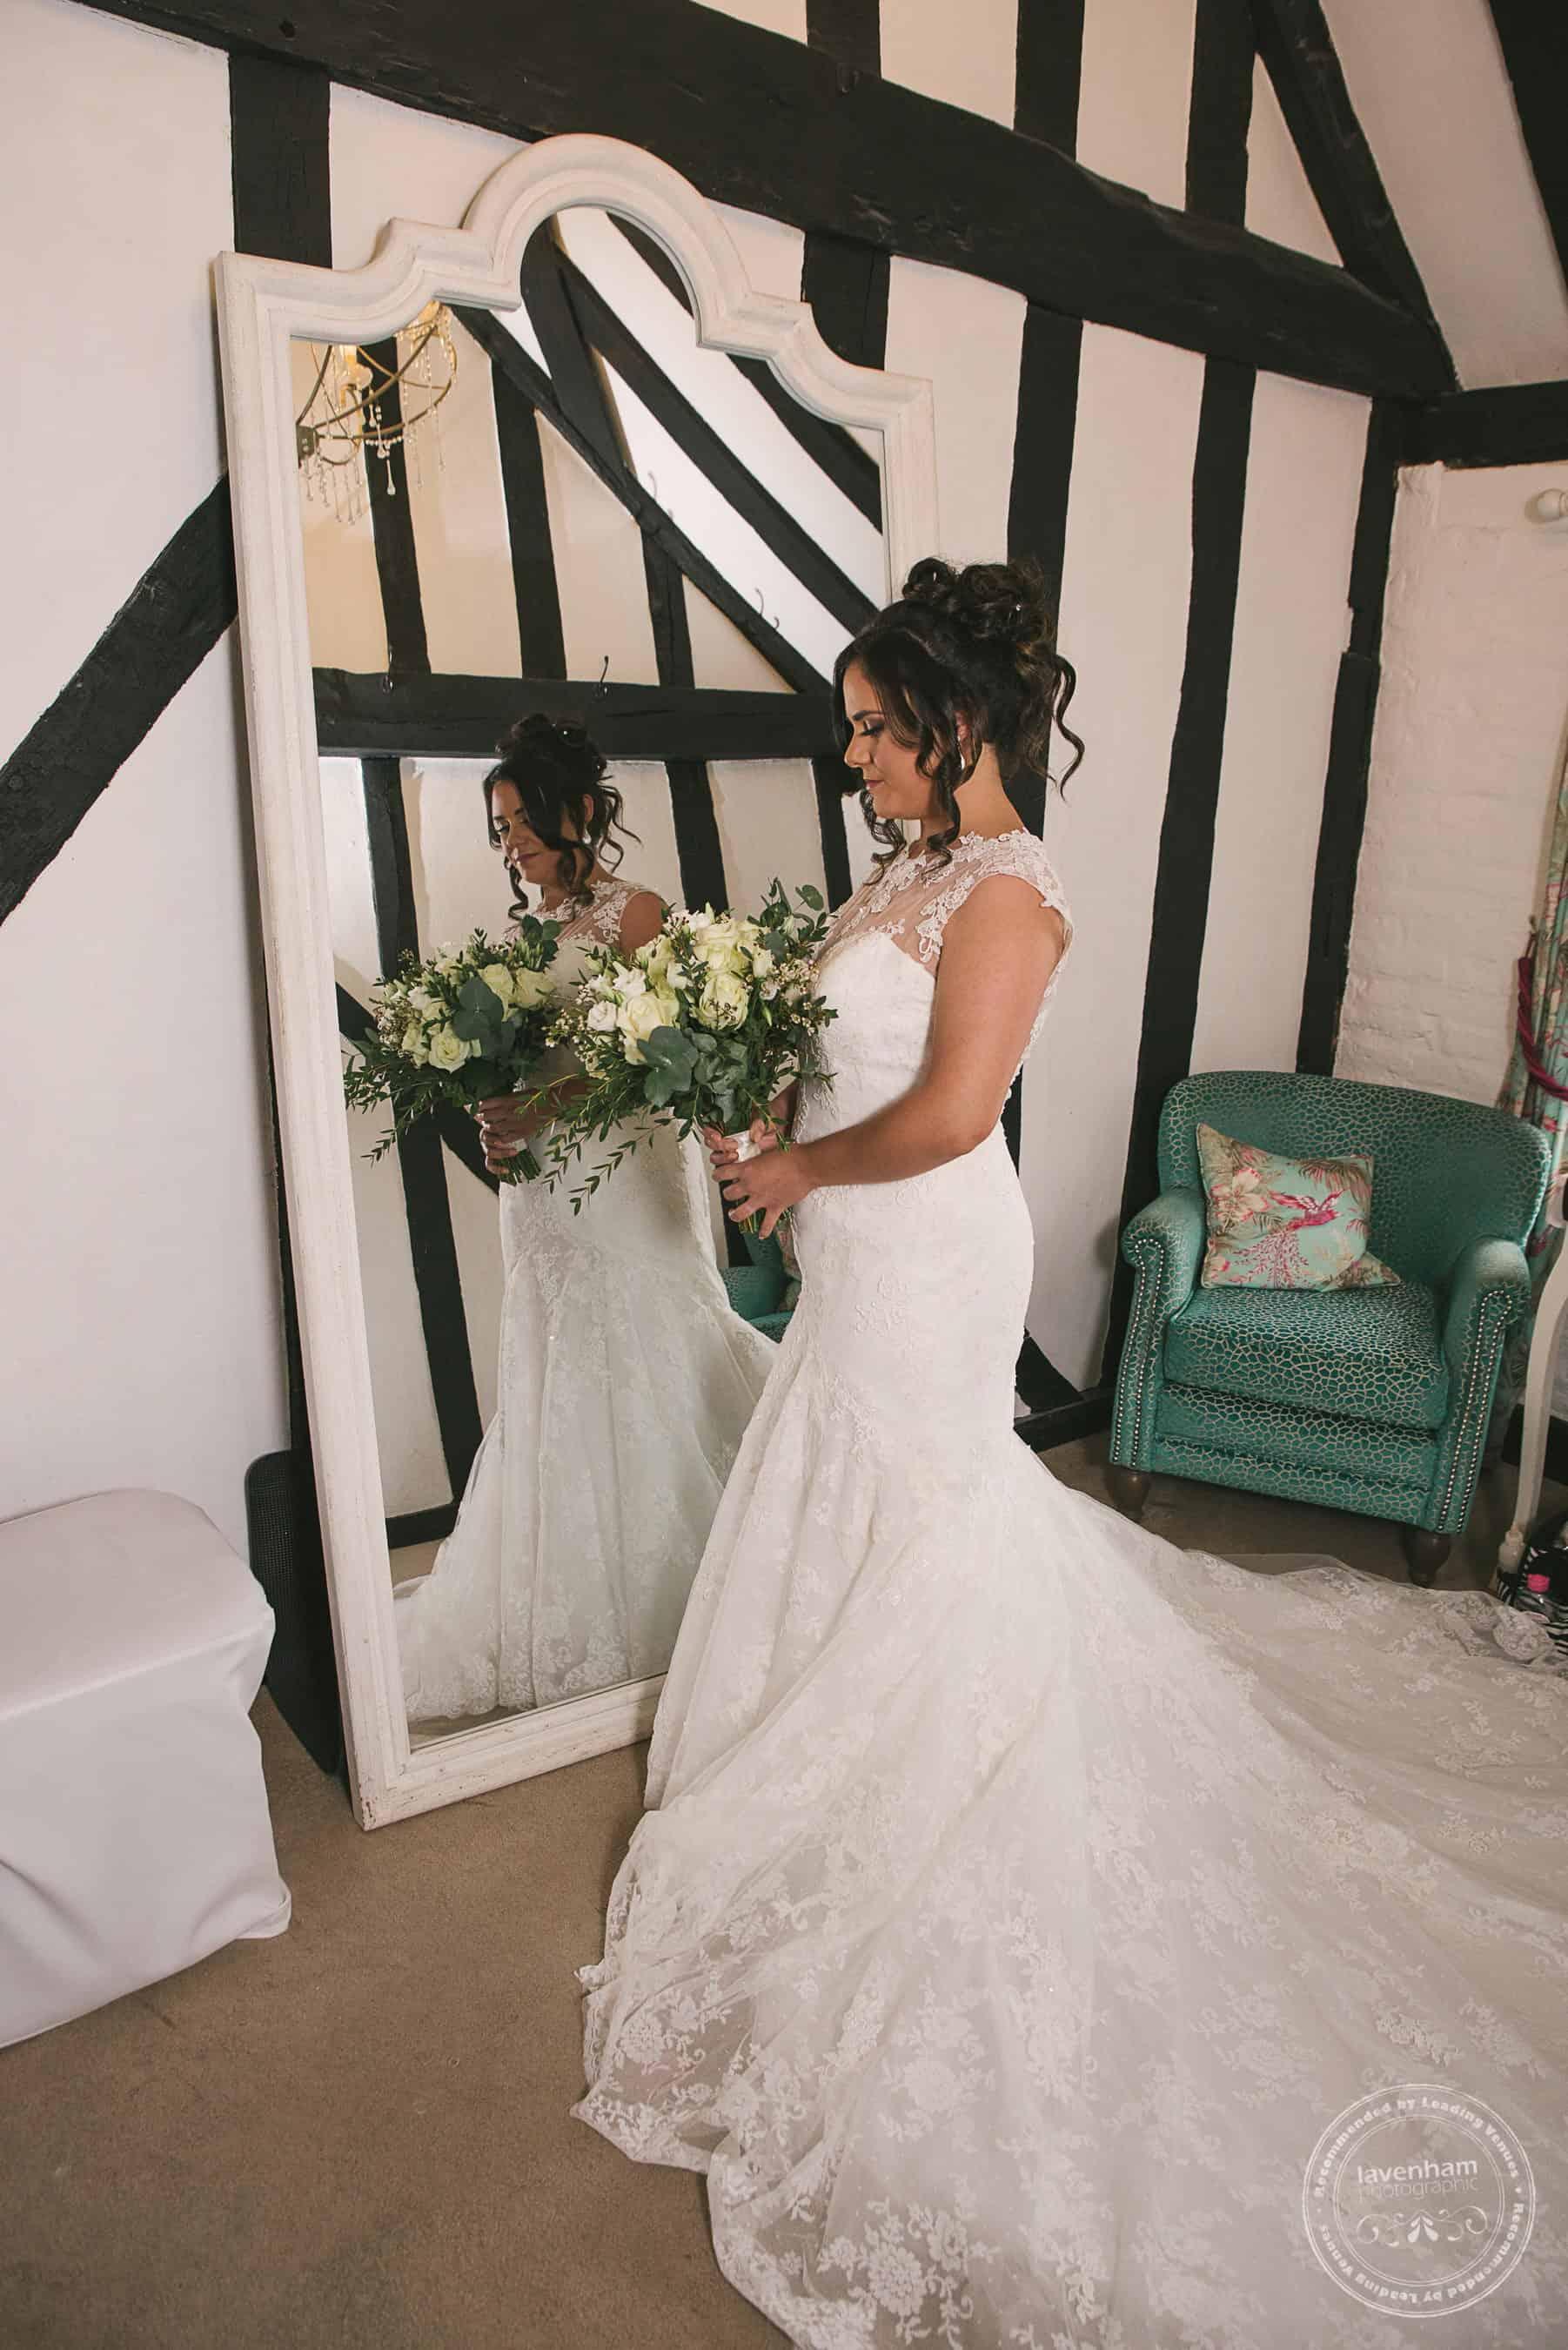 251118 Leez Priory Wedding Photography by Lavenham Photographic 020